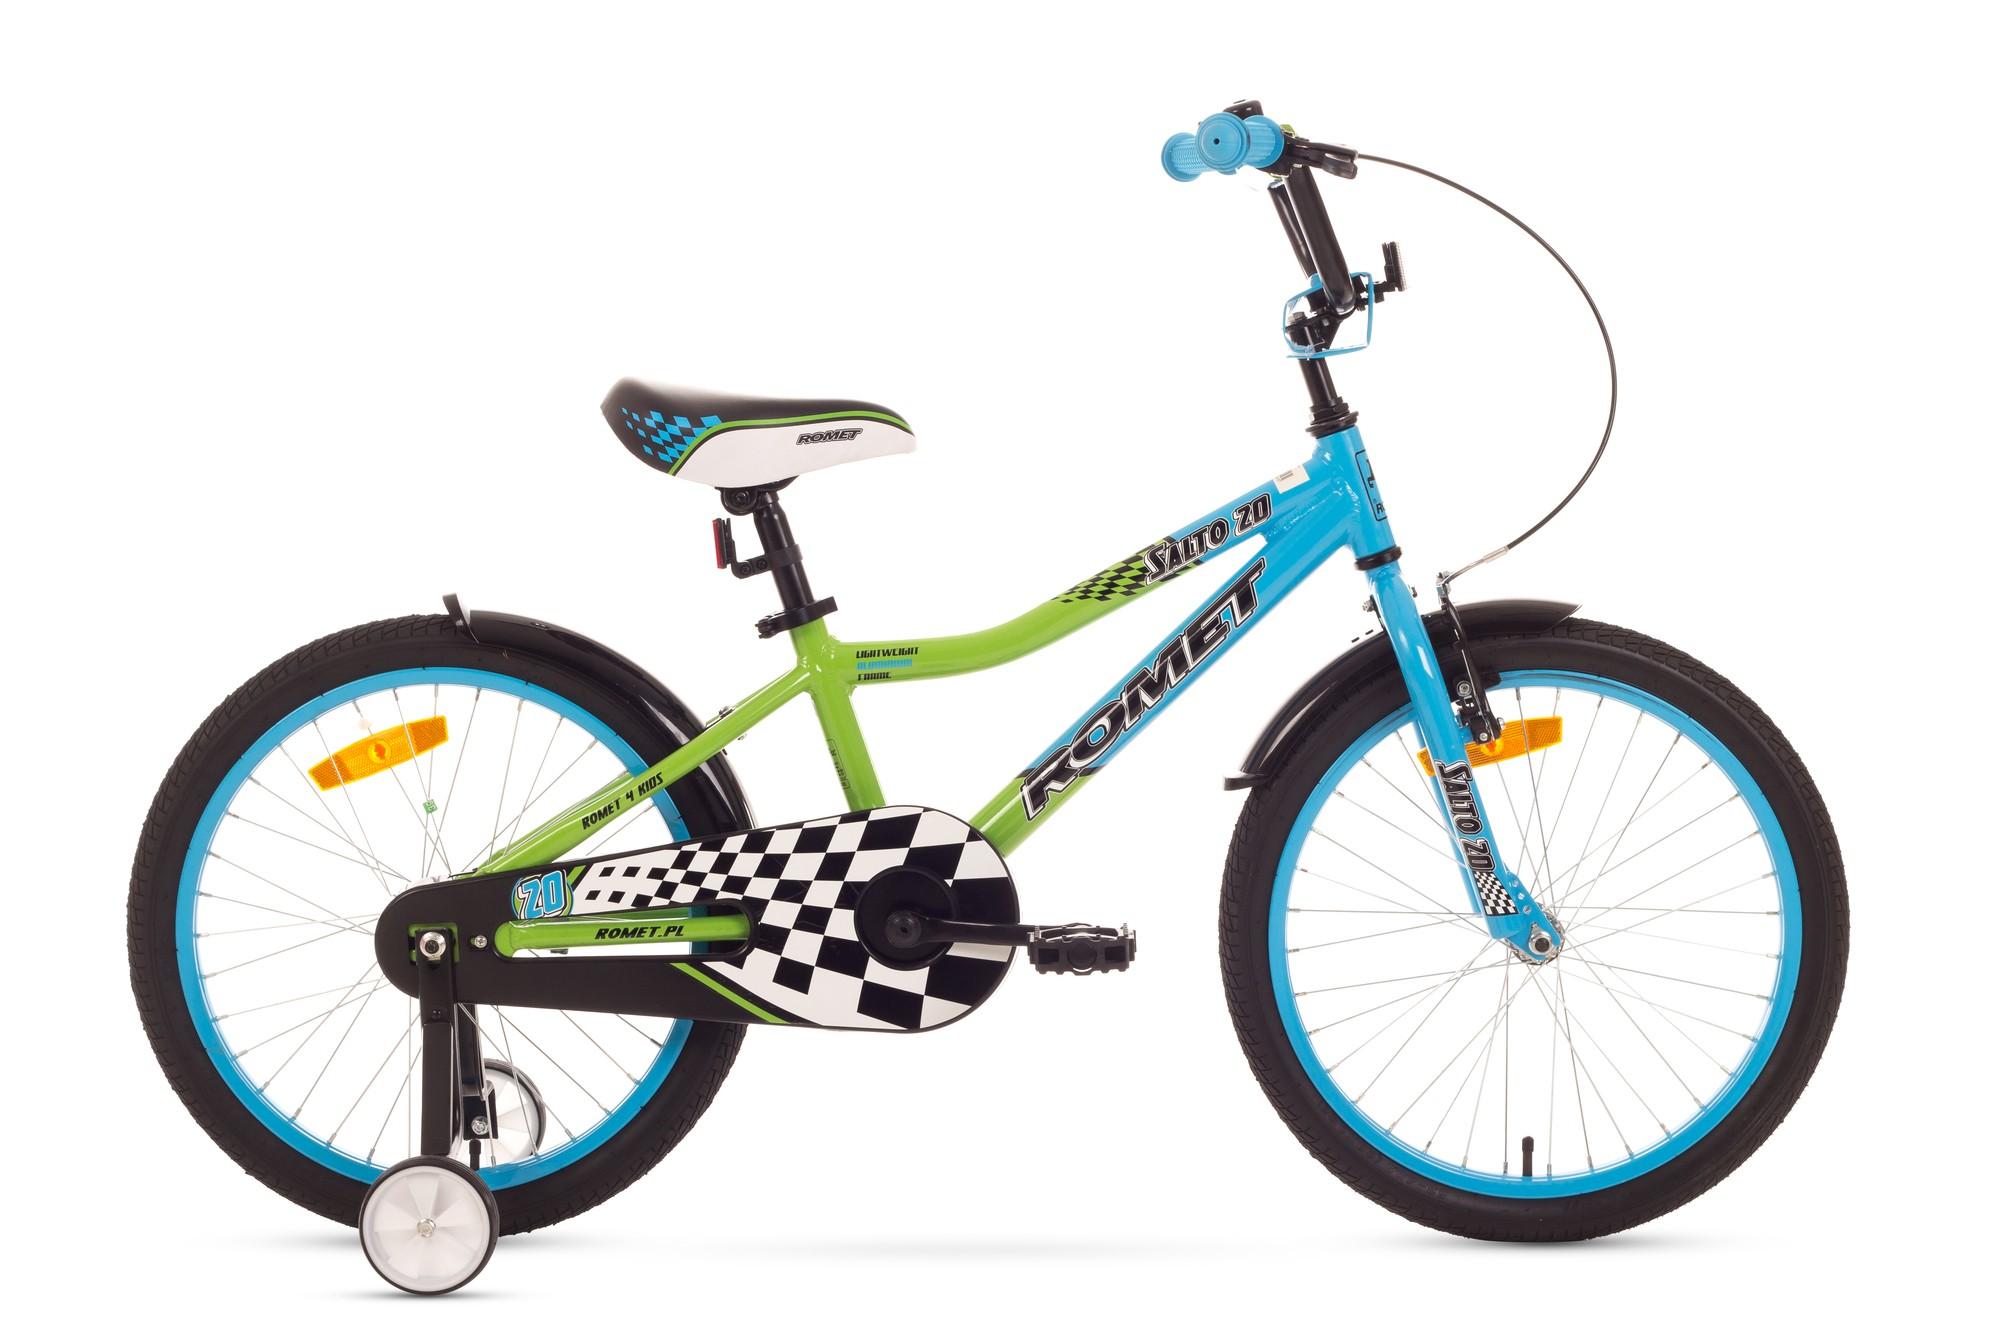 Bicicleta de copii Romet Salto 20 - albastru-verde